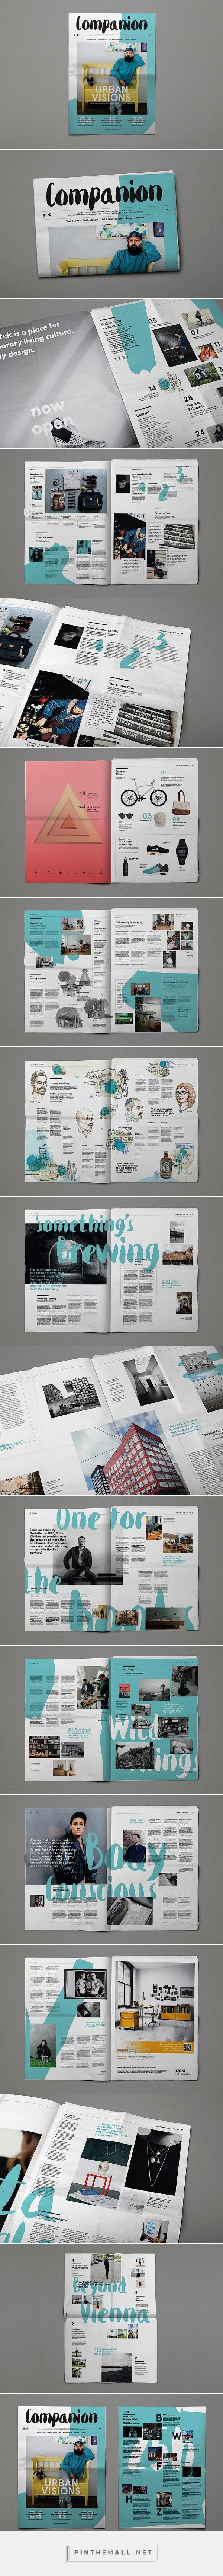 Editorial Design Inspiration: Companion Magazine | Abduzeedo Design Inspiration: